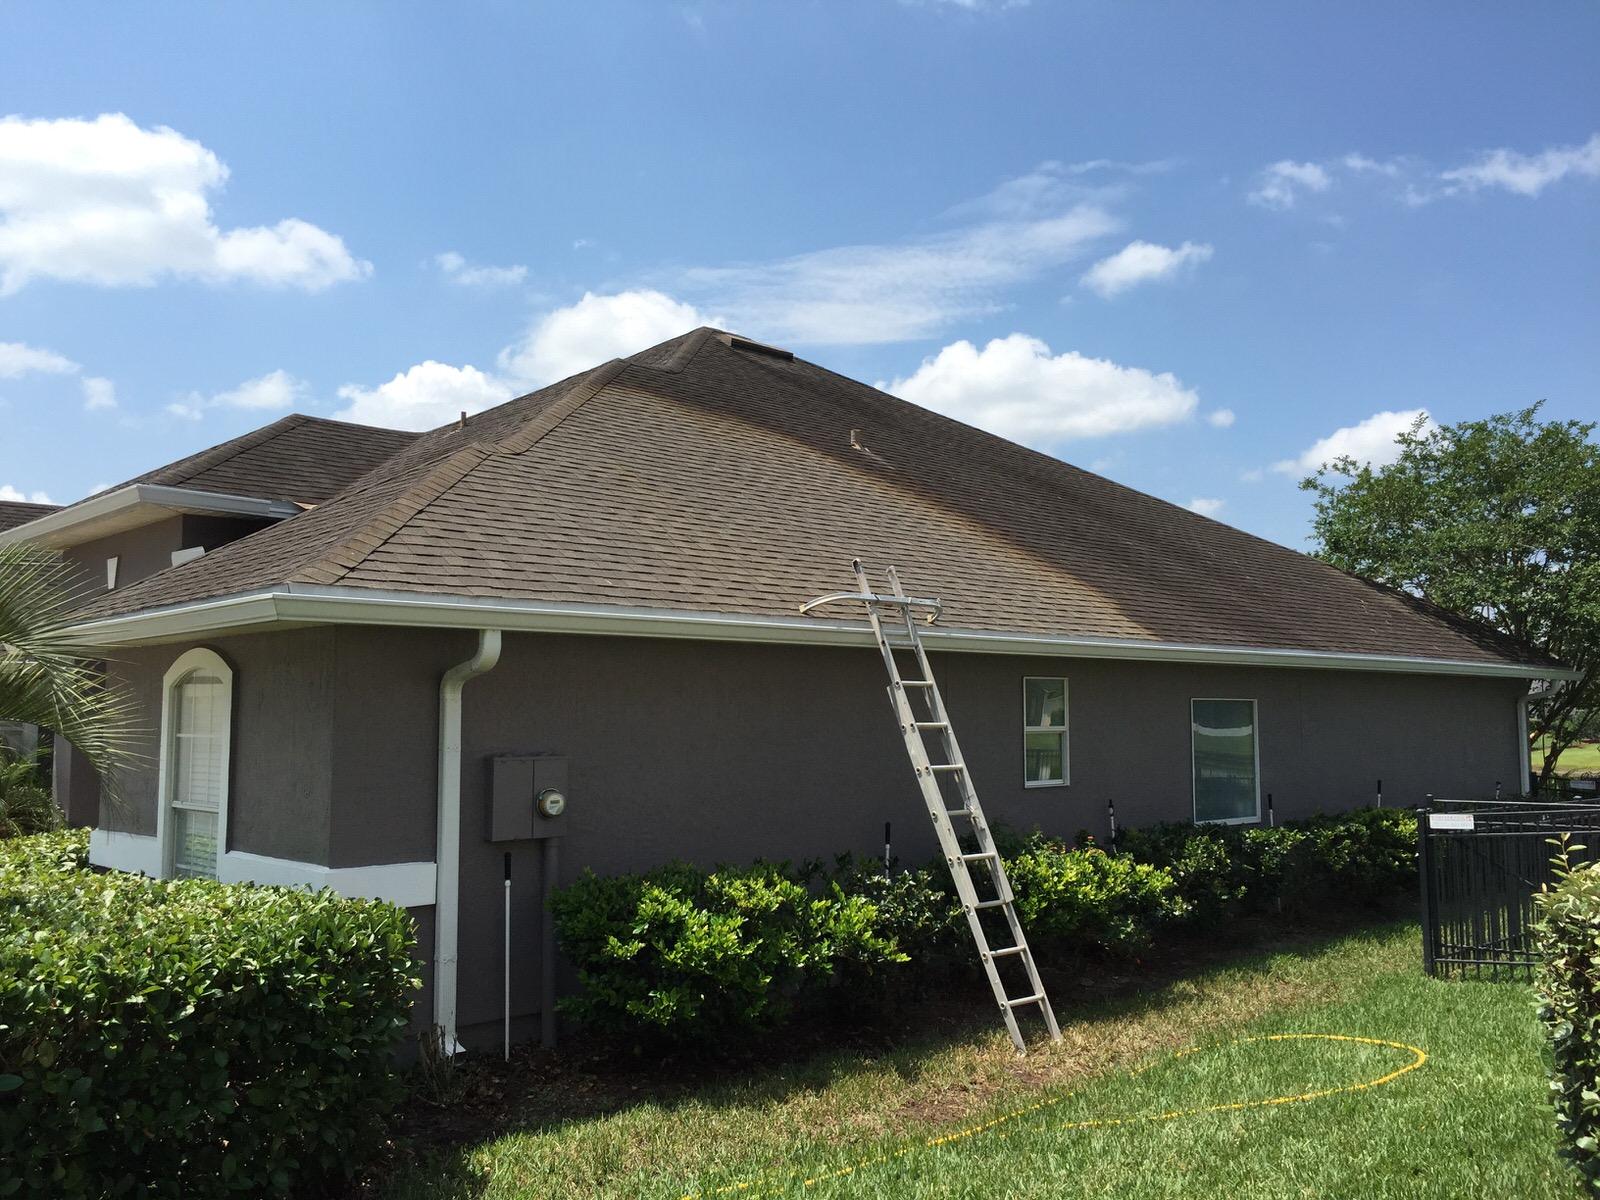 Asphalt Shingle Roof Cleaning In Progress